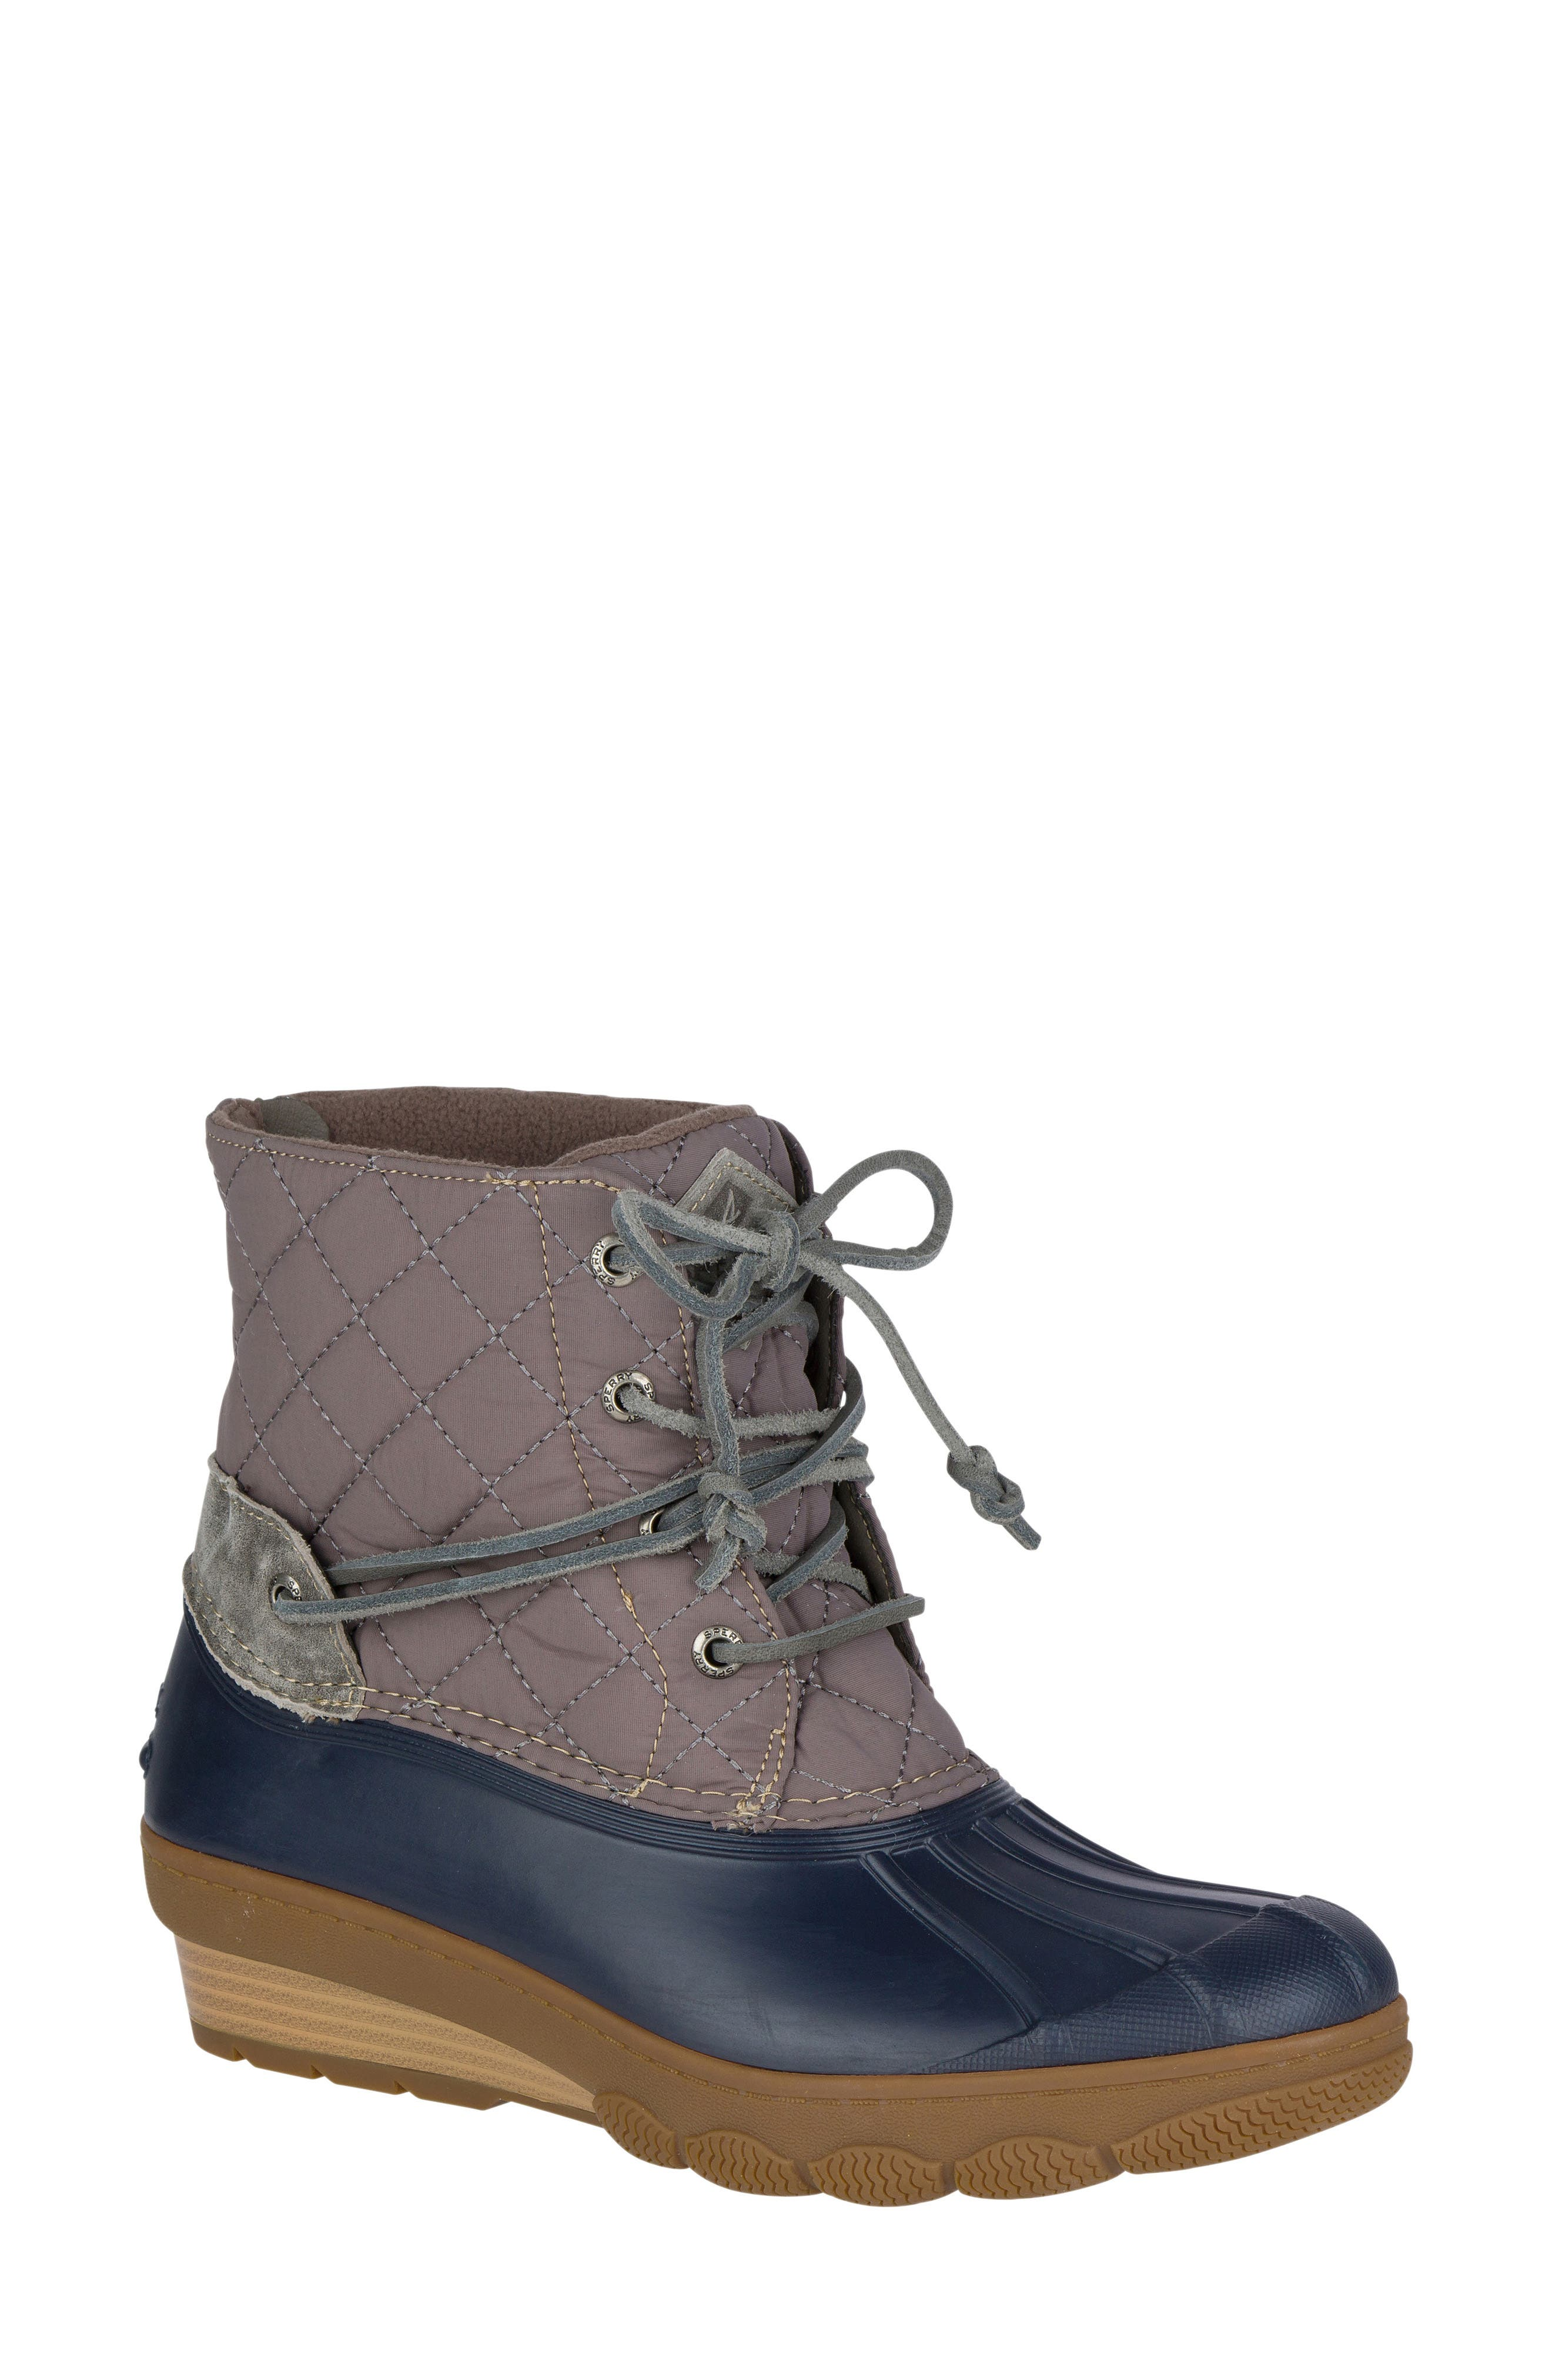 Alternate Image 1 Selected - Sperry Saltwater Quilted Watperproof Boot (Women)